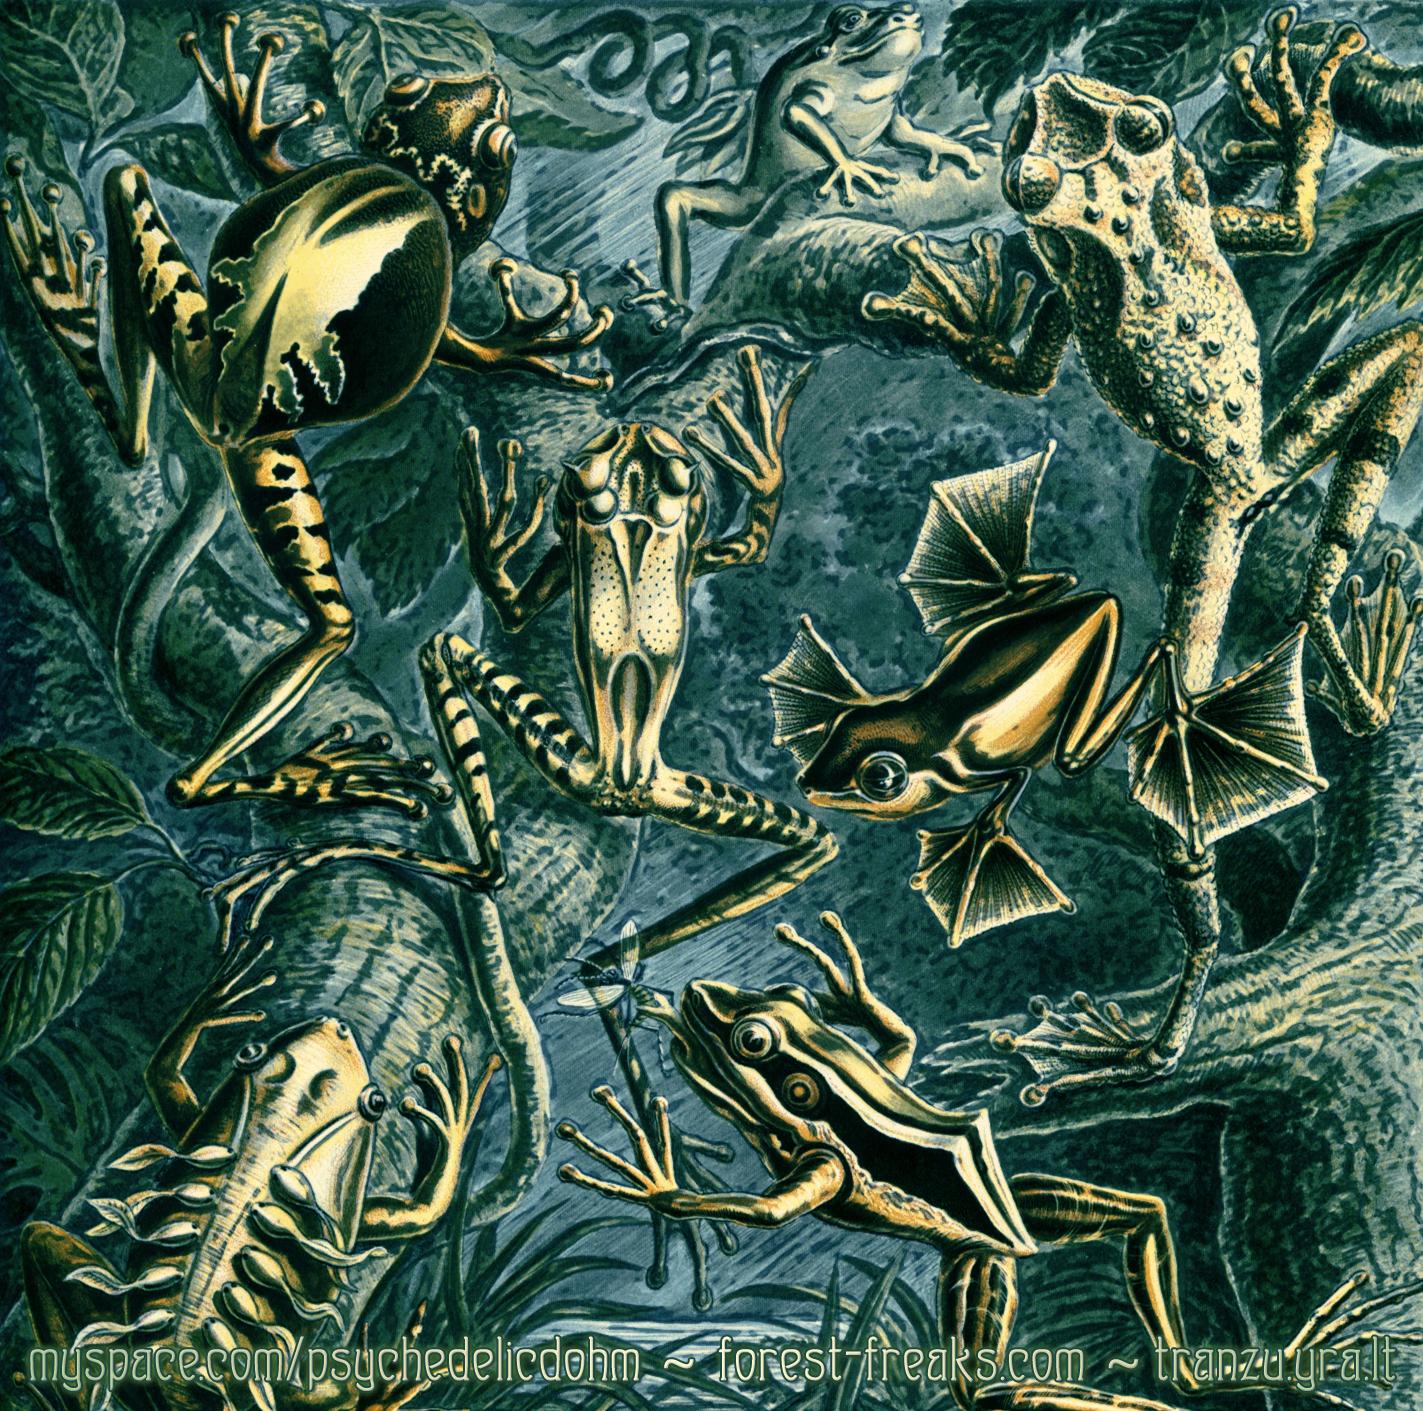 DoHm - Swampology - (Inside CD)